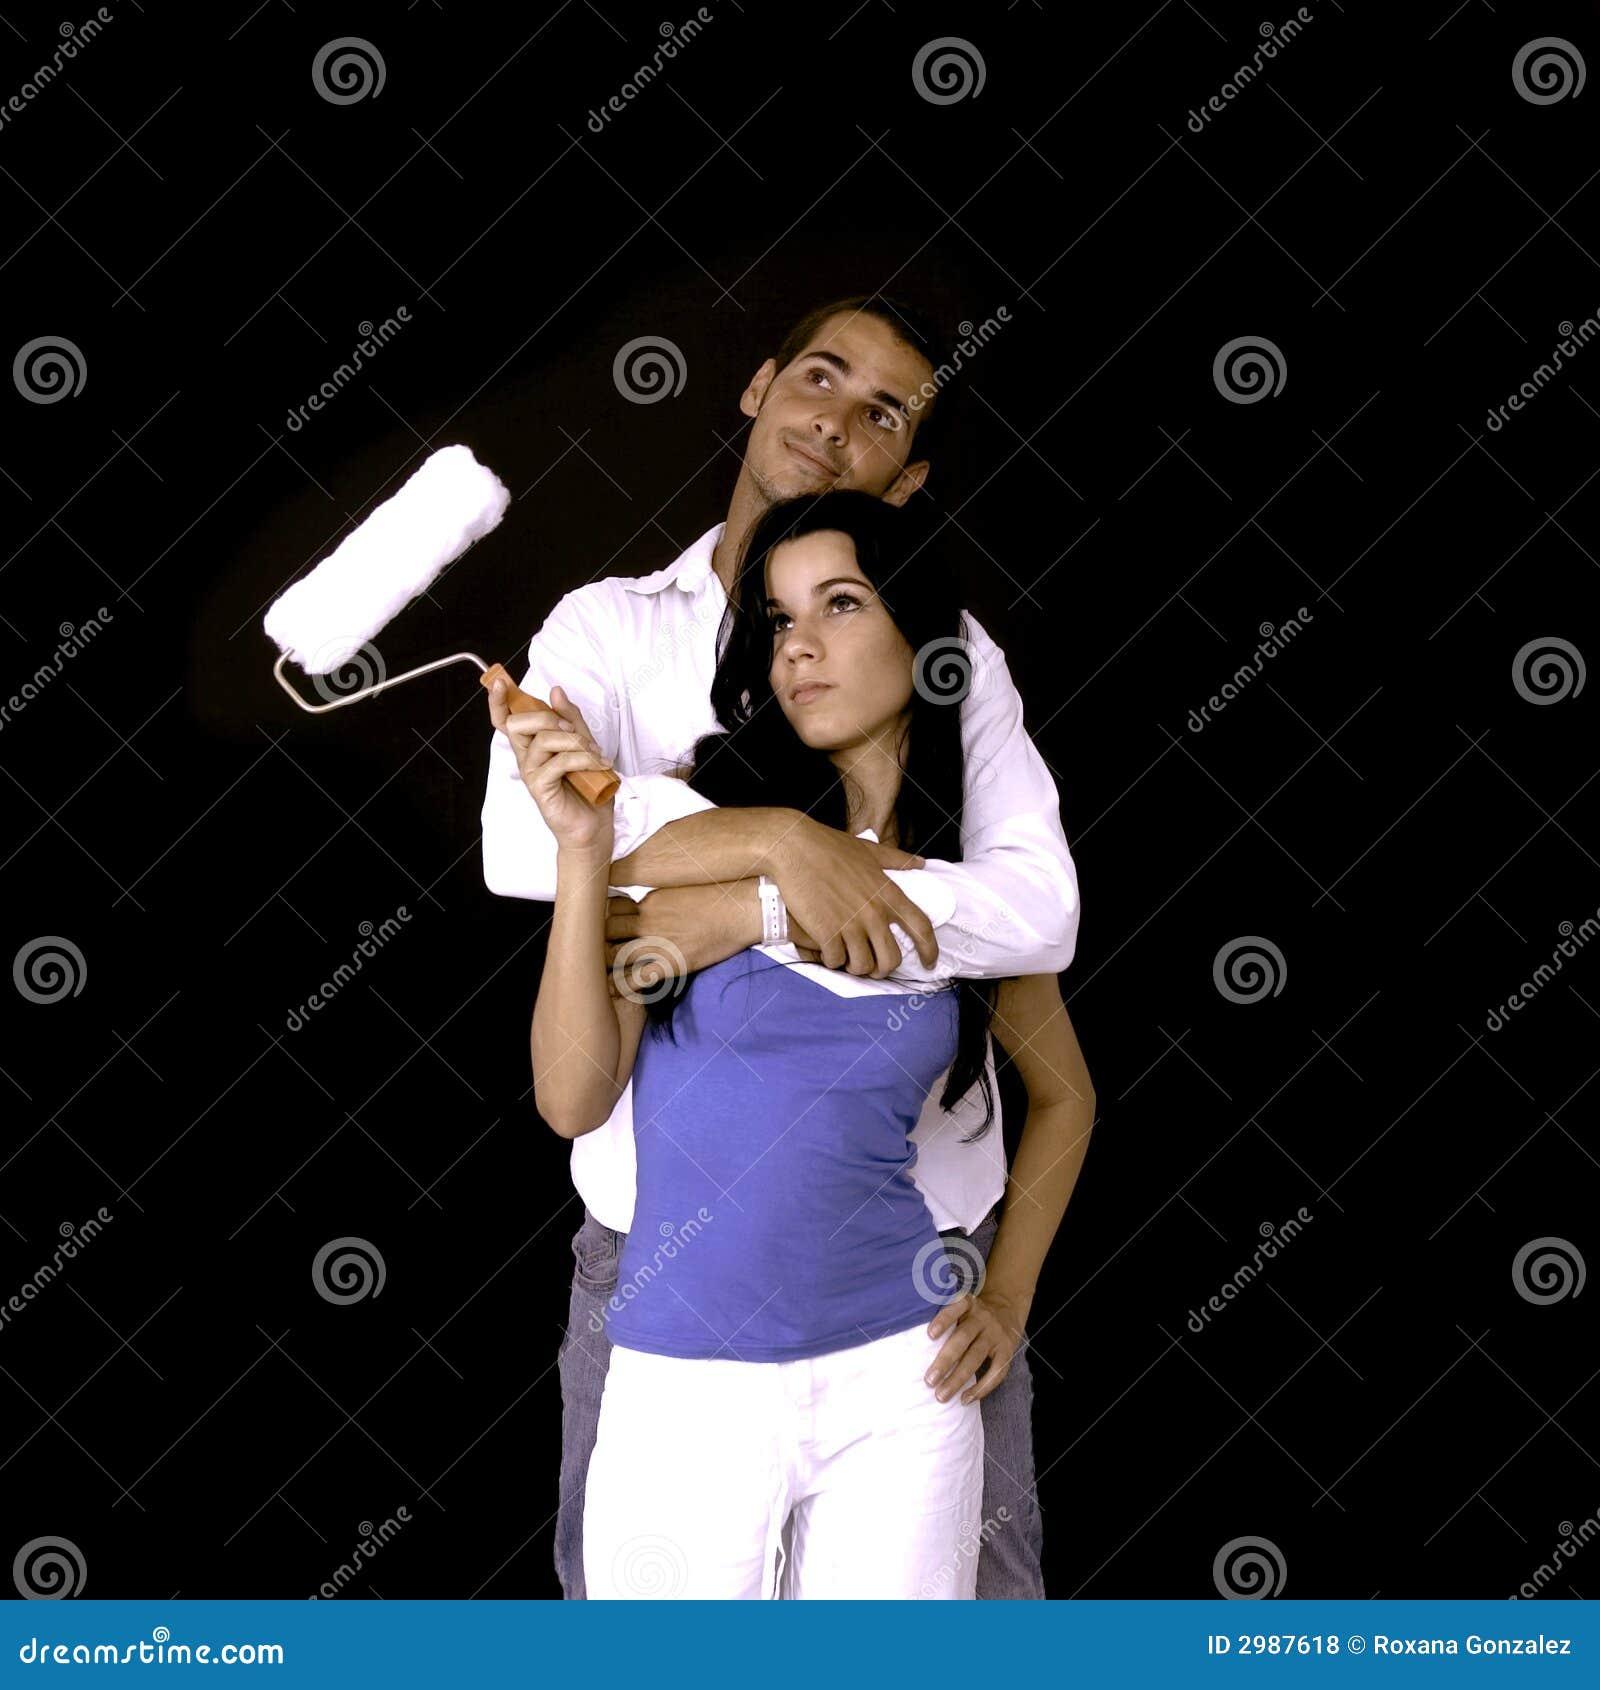 Junge Paare mit Lackrolle